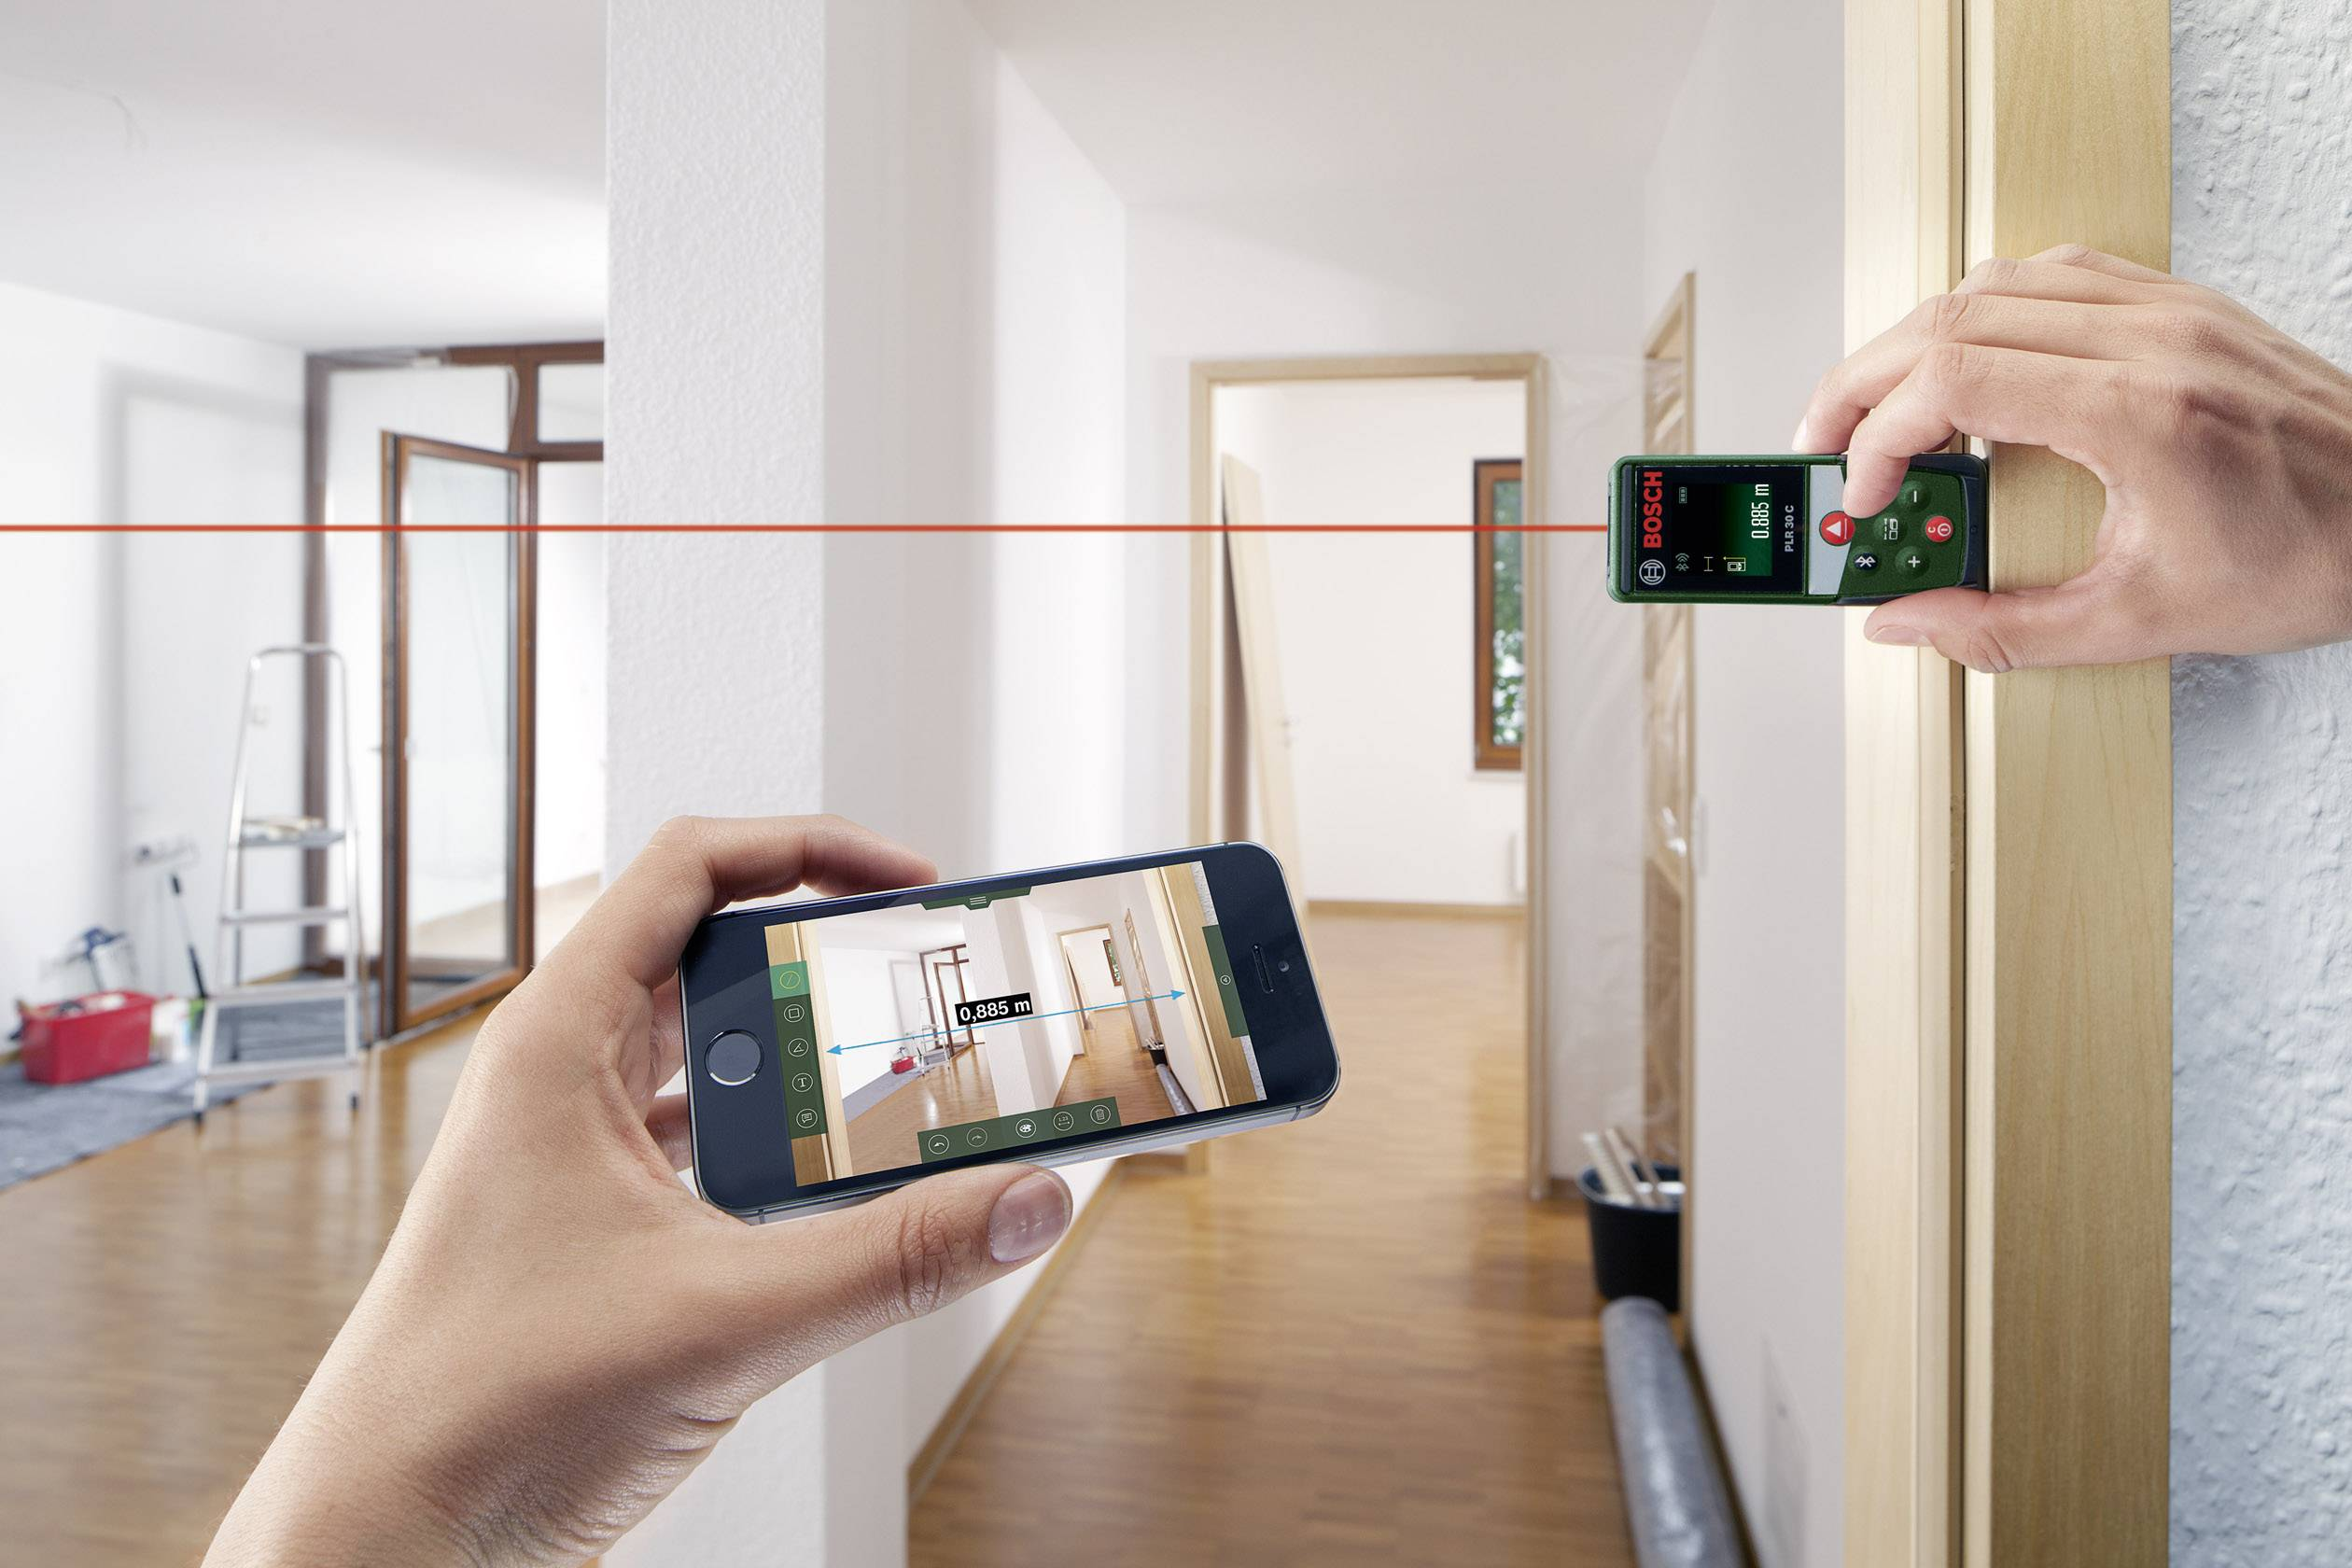 Entfernungsmesser Berlin : Bosch home and garden plr c laser entfernungsmesser bluetooth